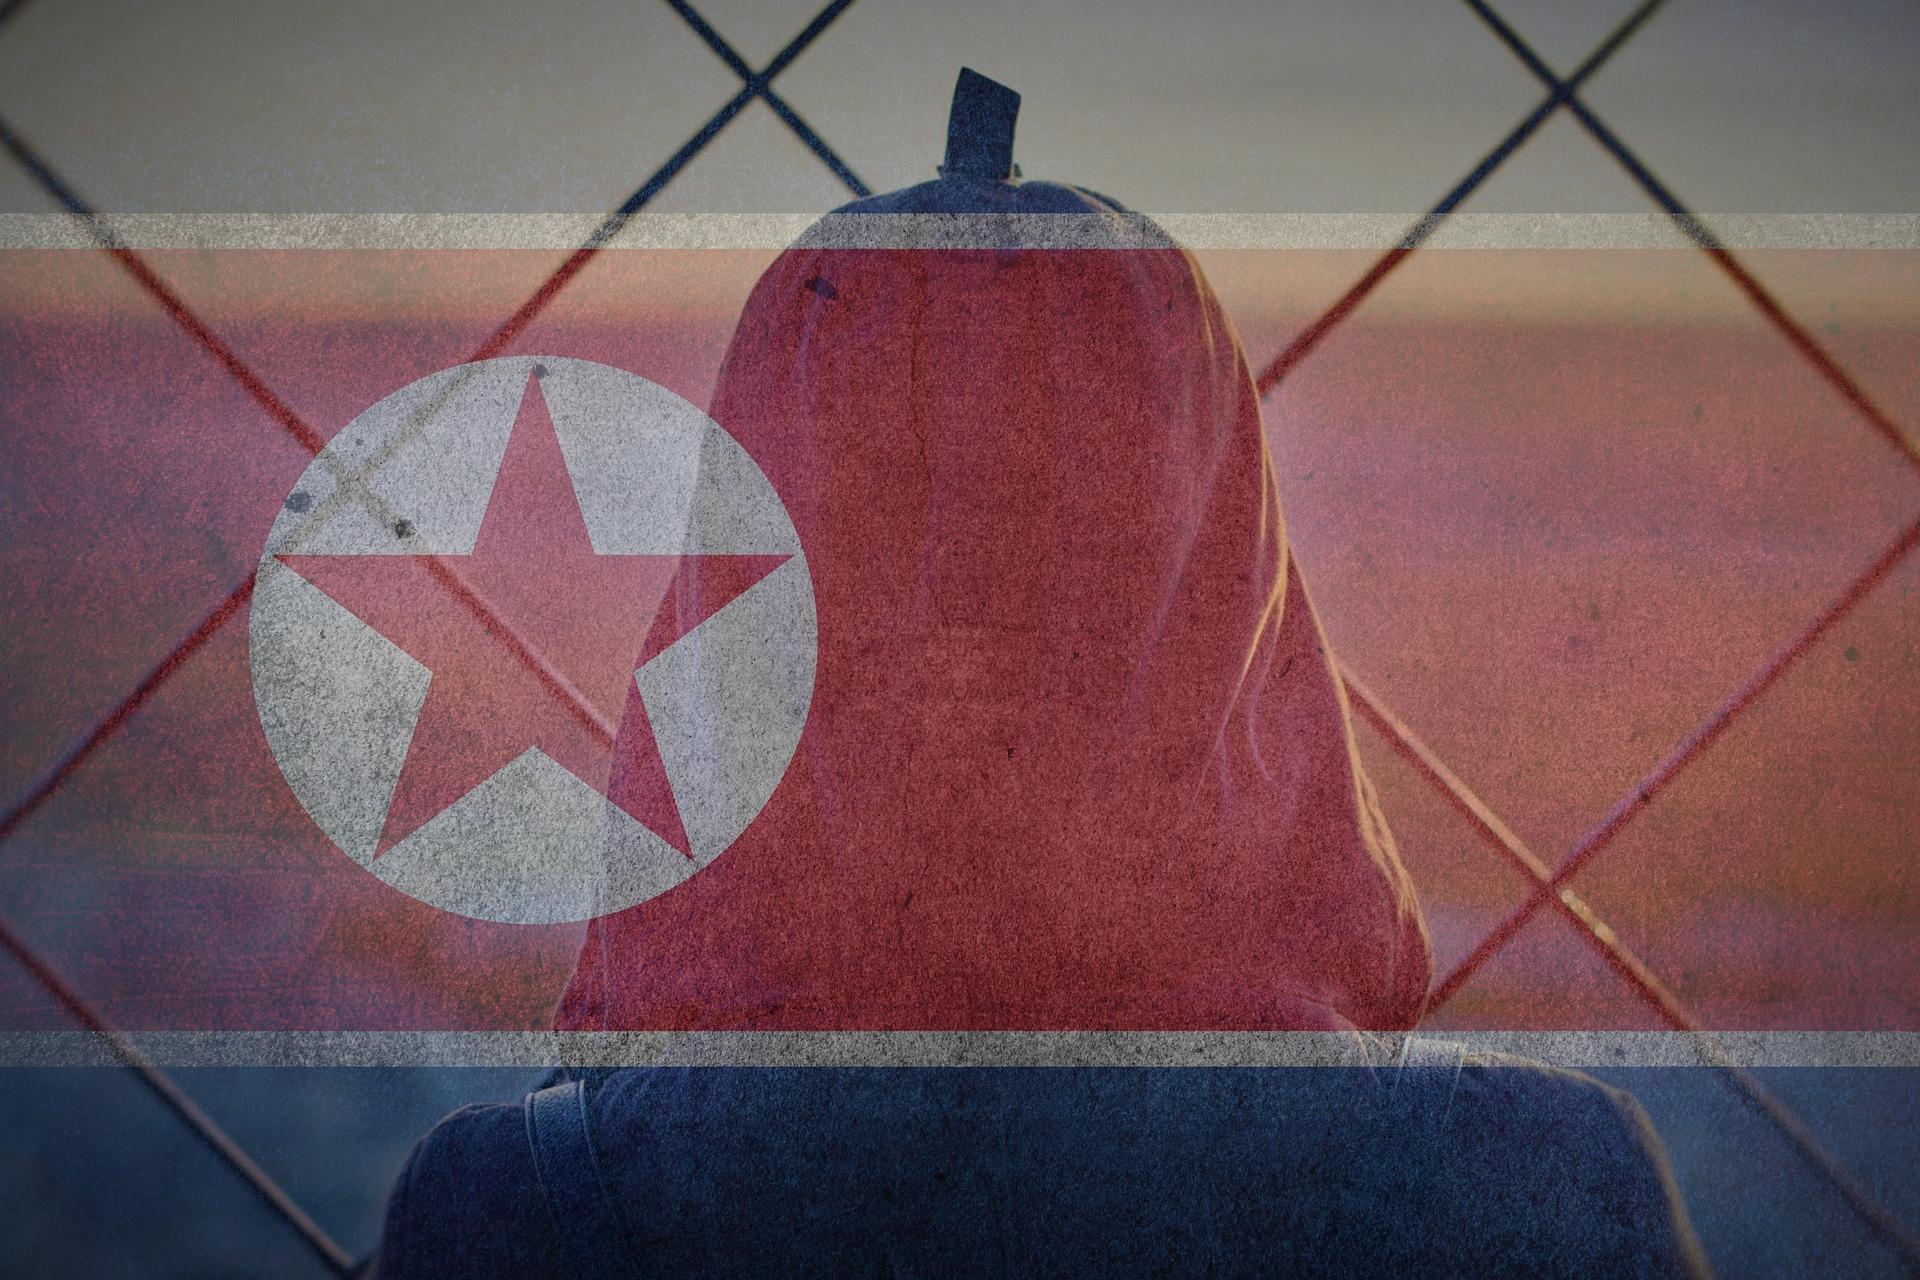 Nordkorea Menschenrechte Fakten